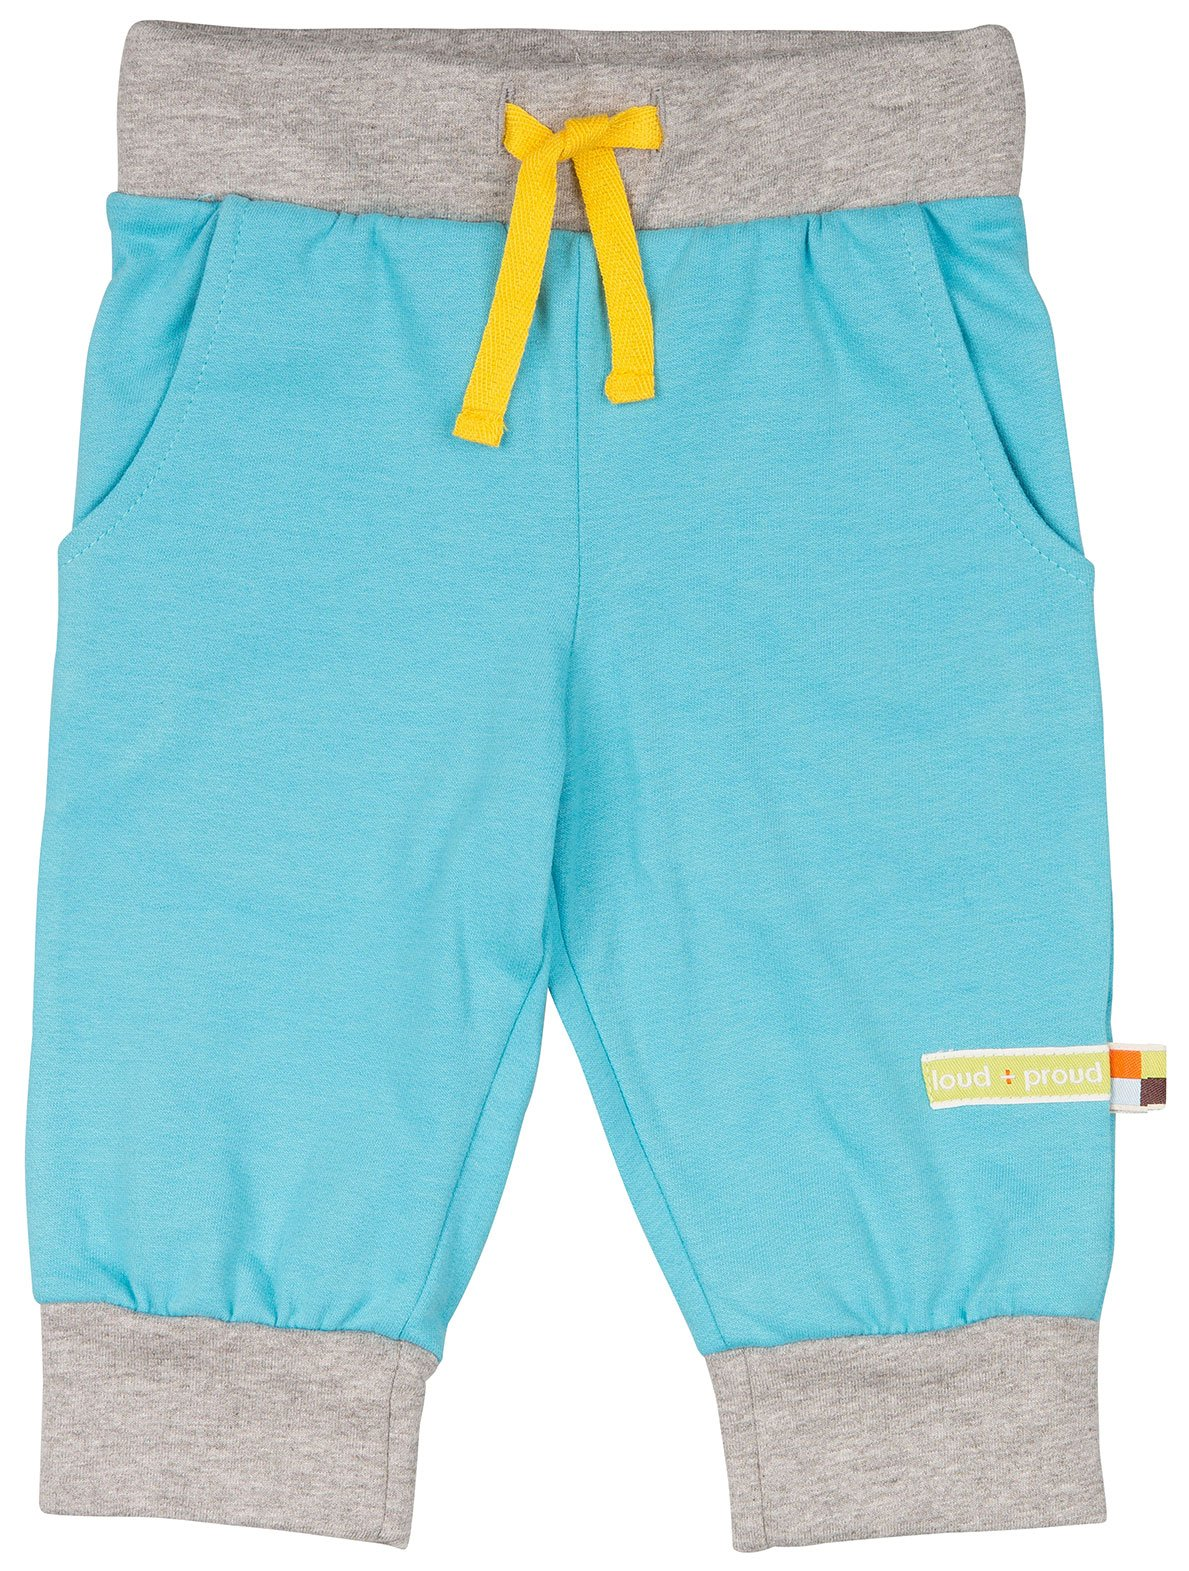 loud + proud Sweathose Pantalones para Bebés 1